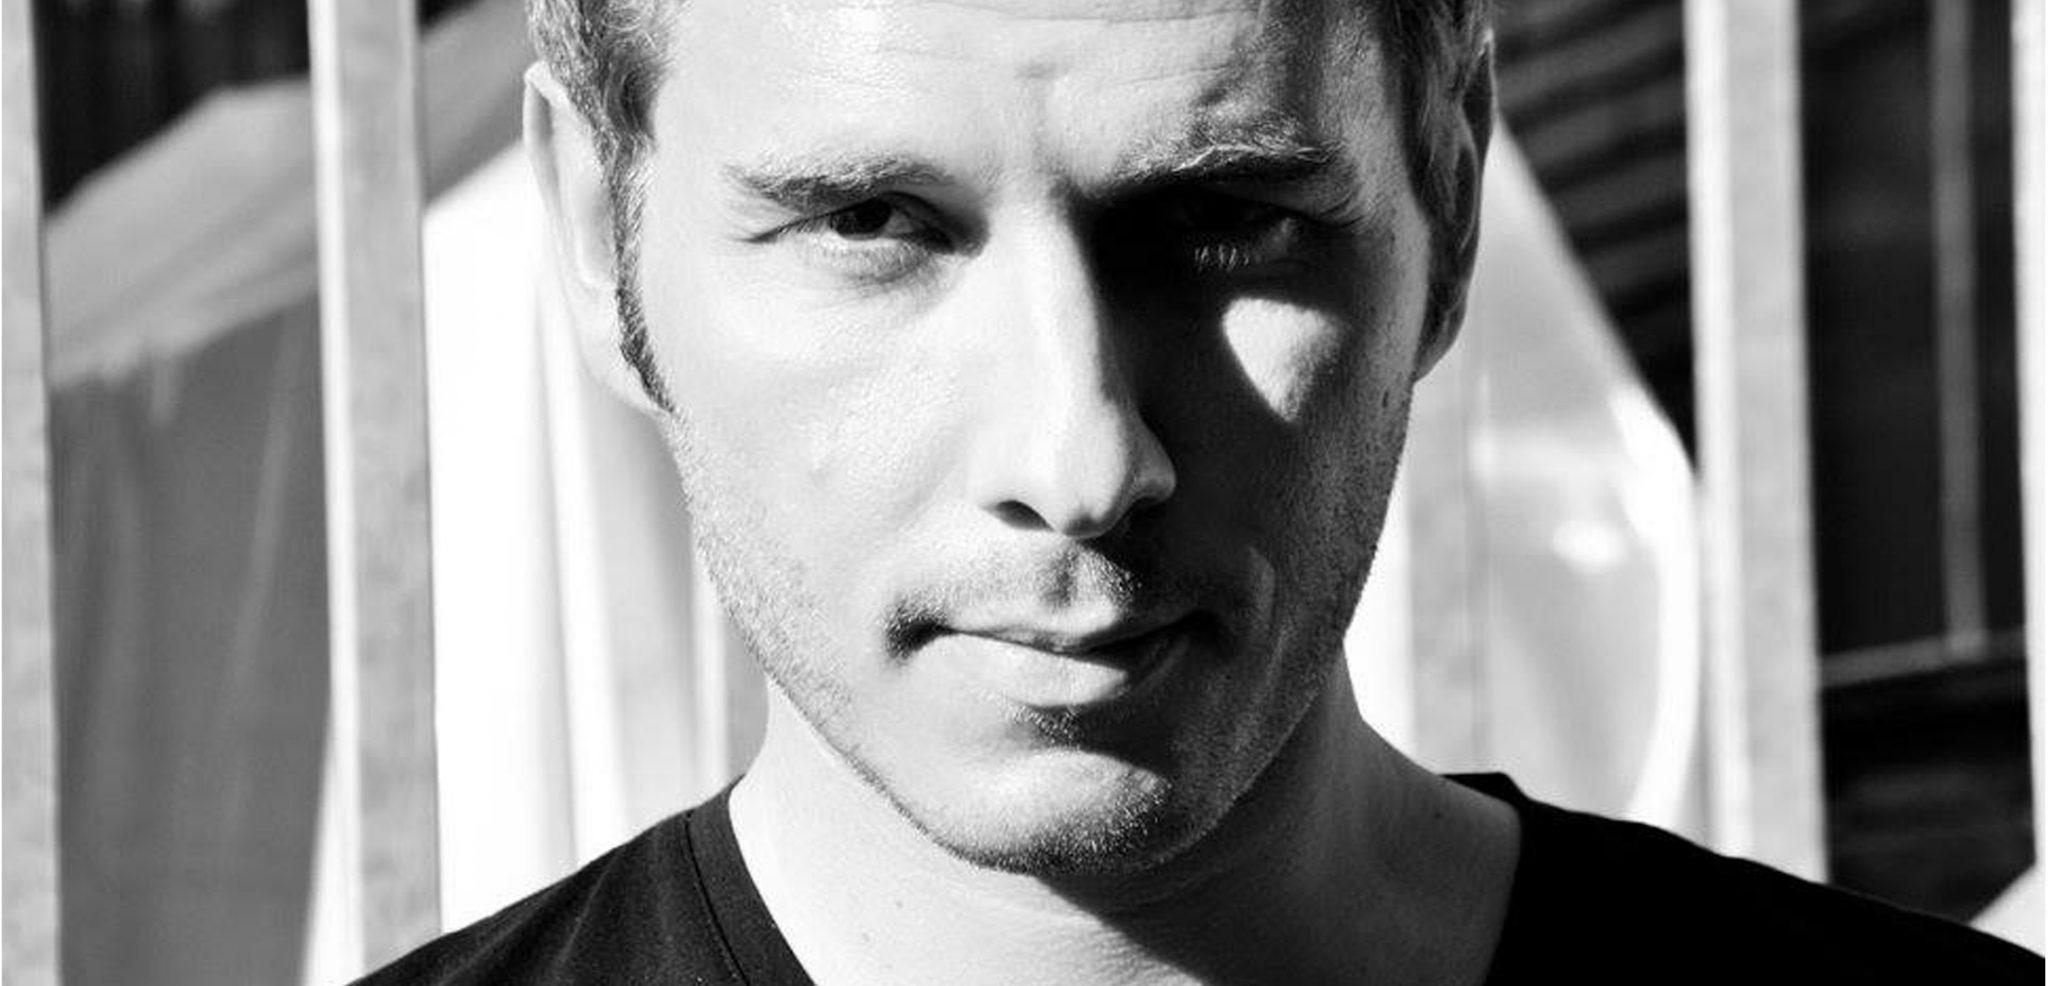 Dario D'Attis - Diss In Minor EP hero